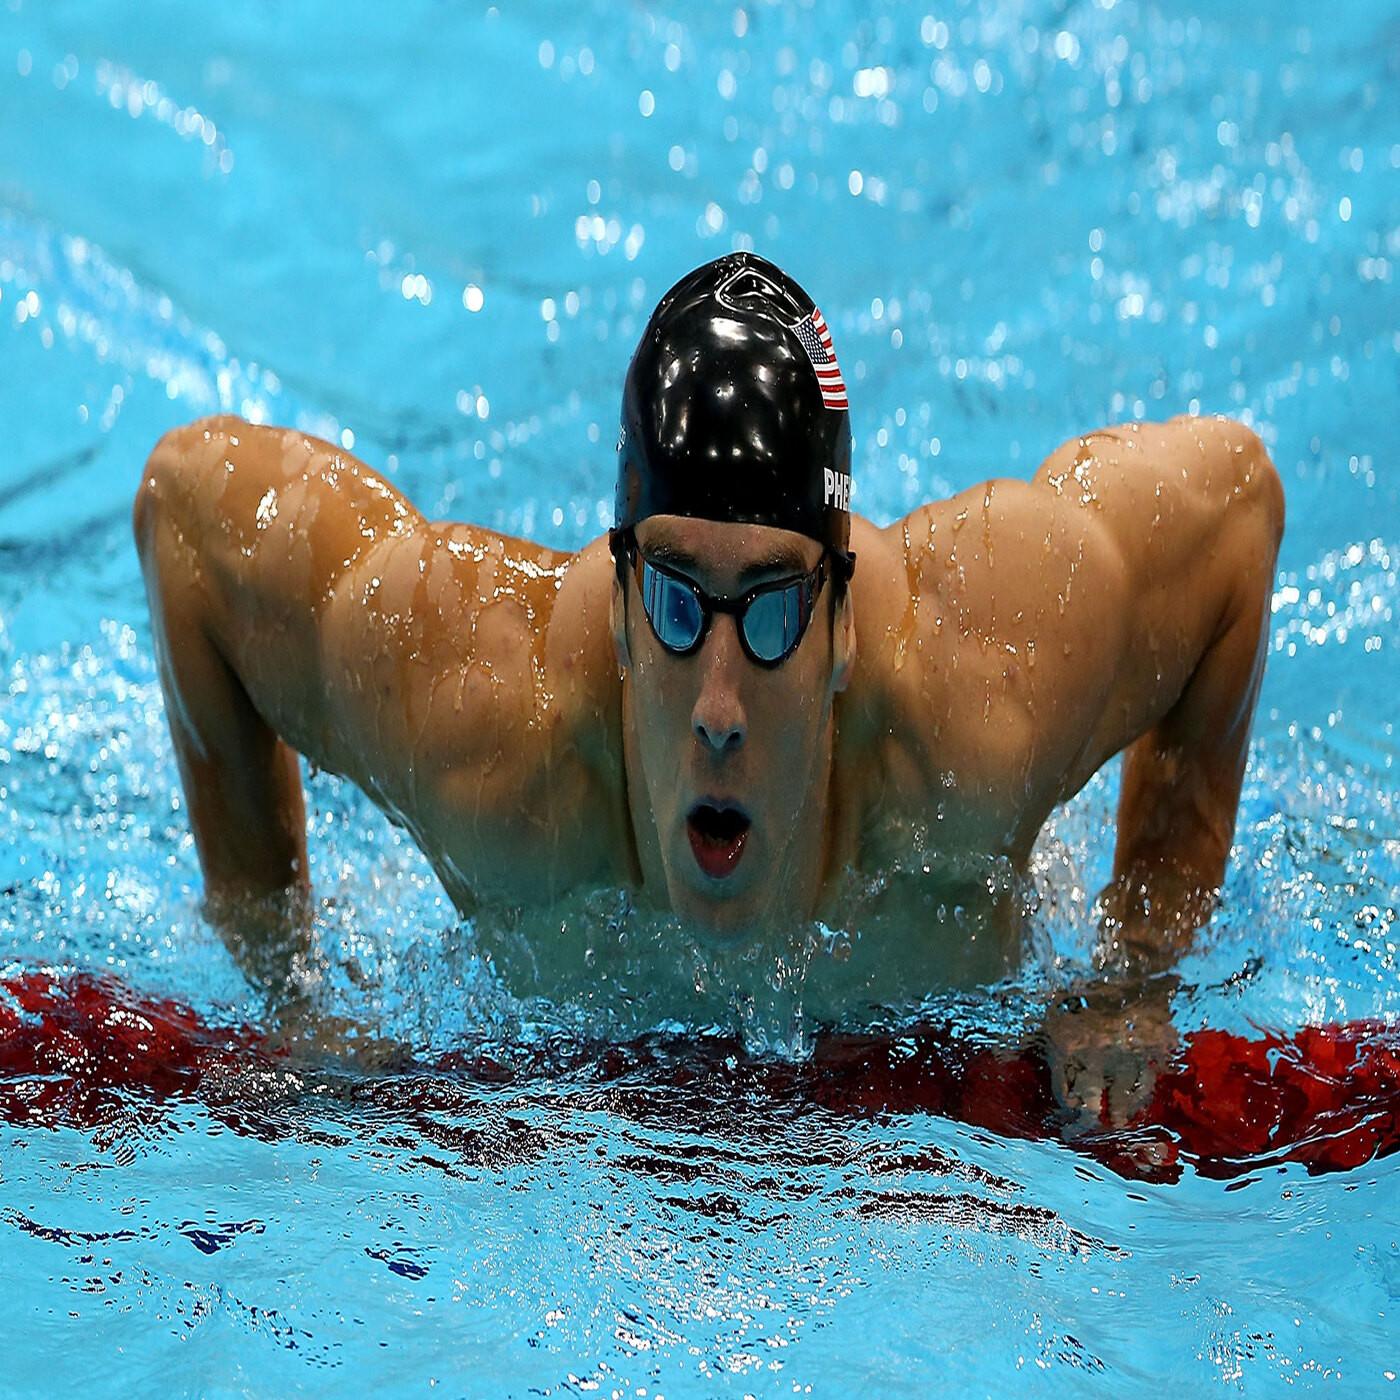 L'exploit de Phelps en 2008